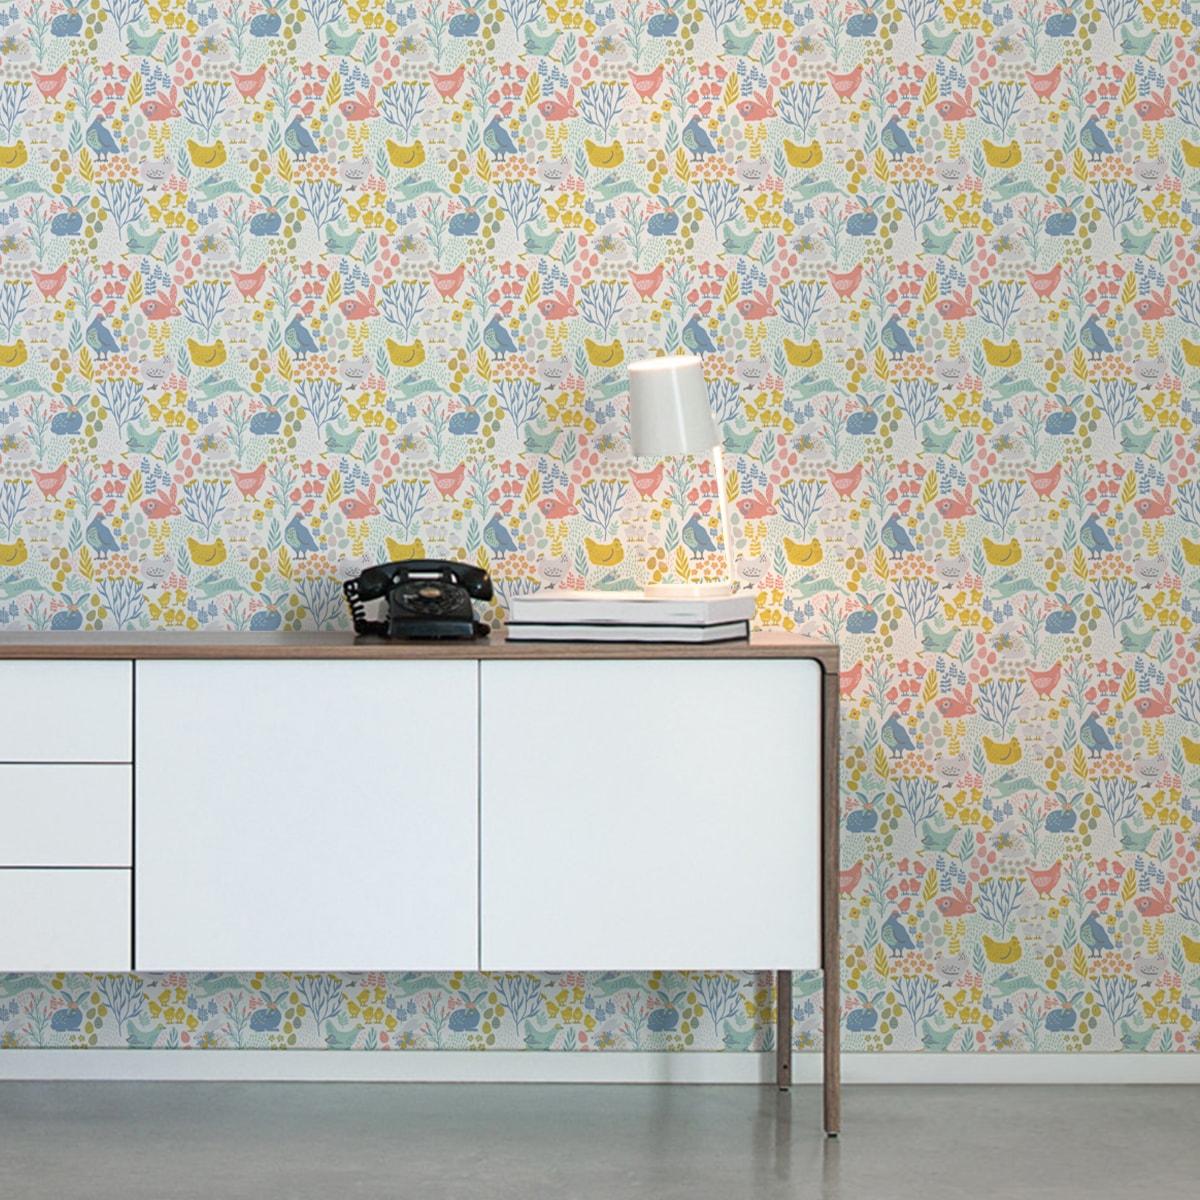 "Wandtapete rosa: Design Tapete ""Hoppelgarten"" mit bunten Land Hühnern, Hasen & Blumen Vliestapete Wandgestaltung"